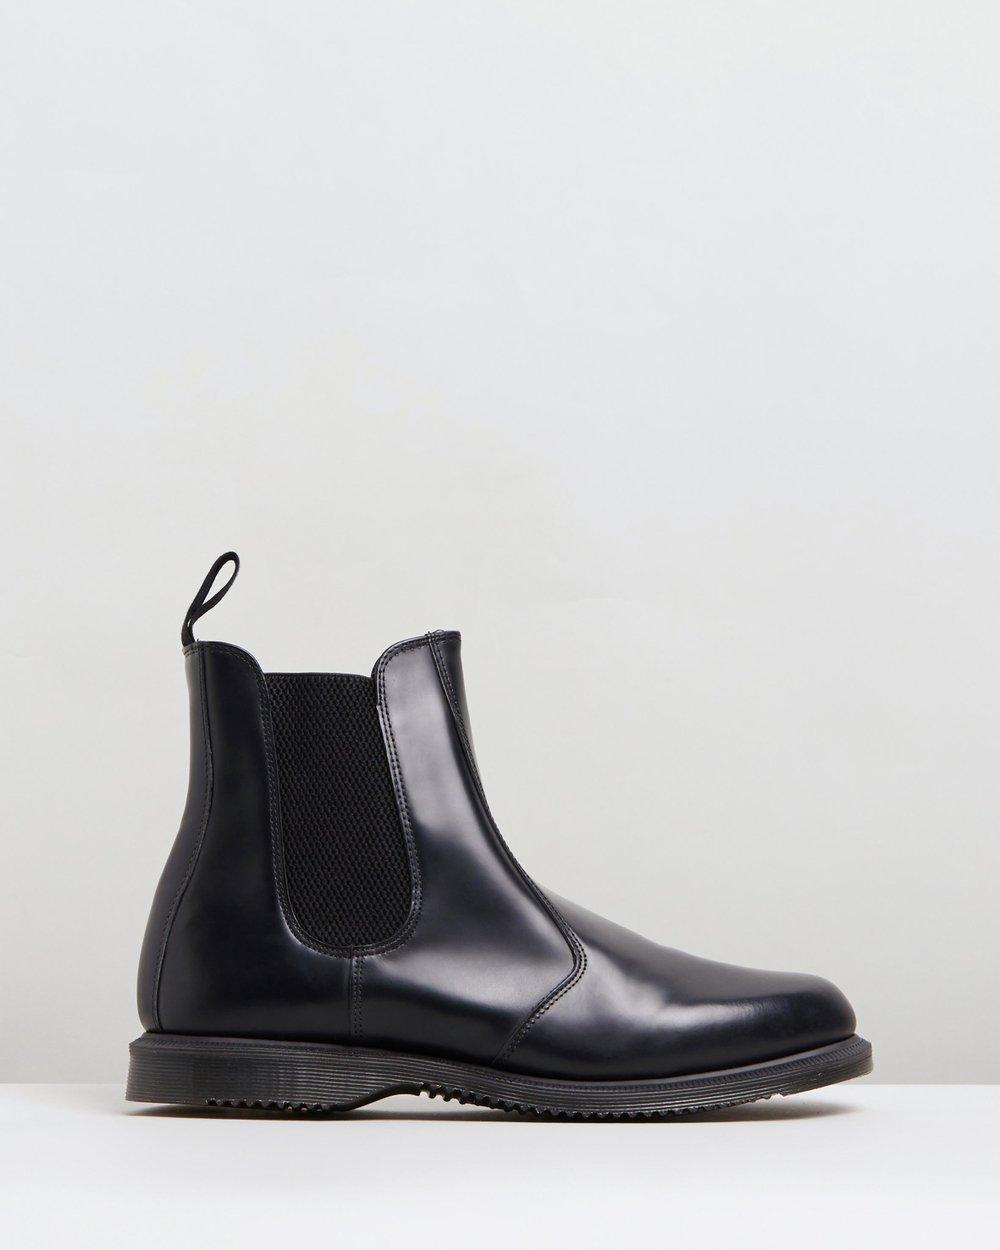 bb21c932a5d Flora Kensington Boots - Women's